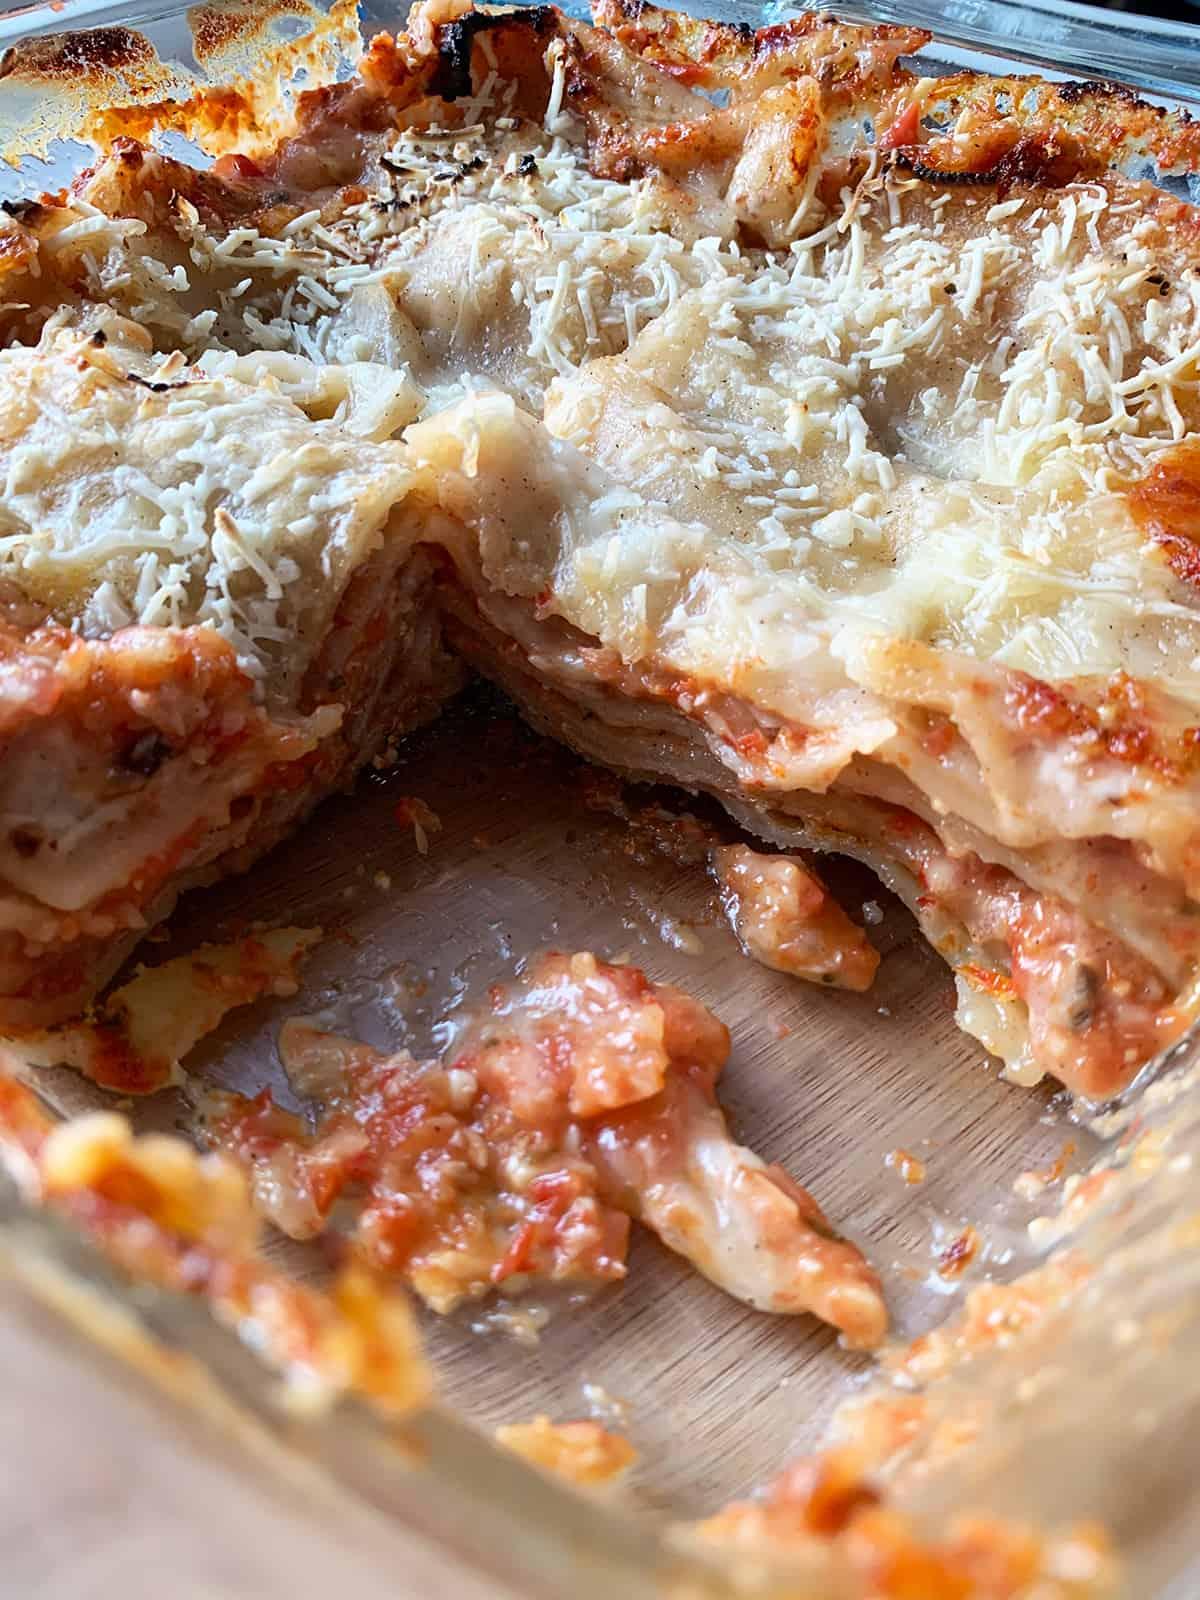 vegan gluten free lasagna up close with a piece missing